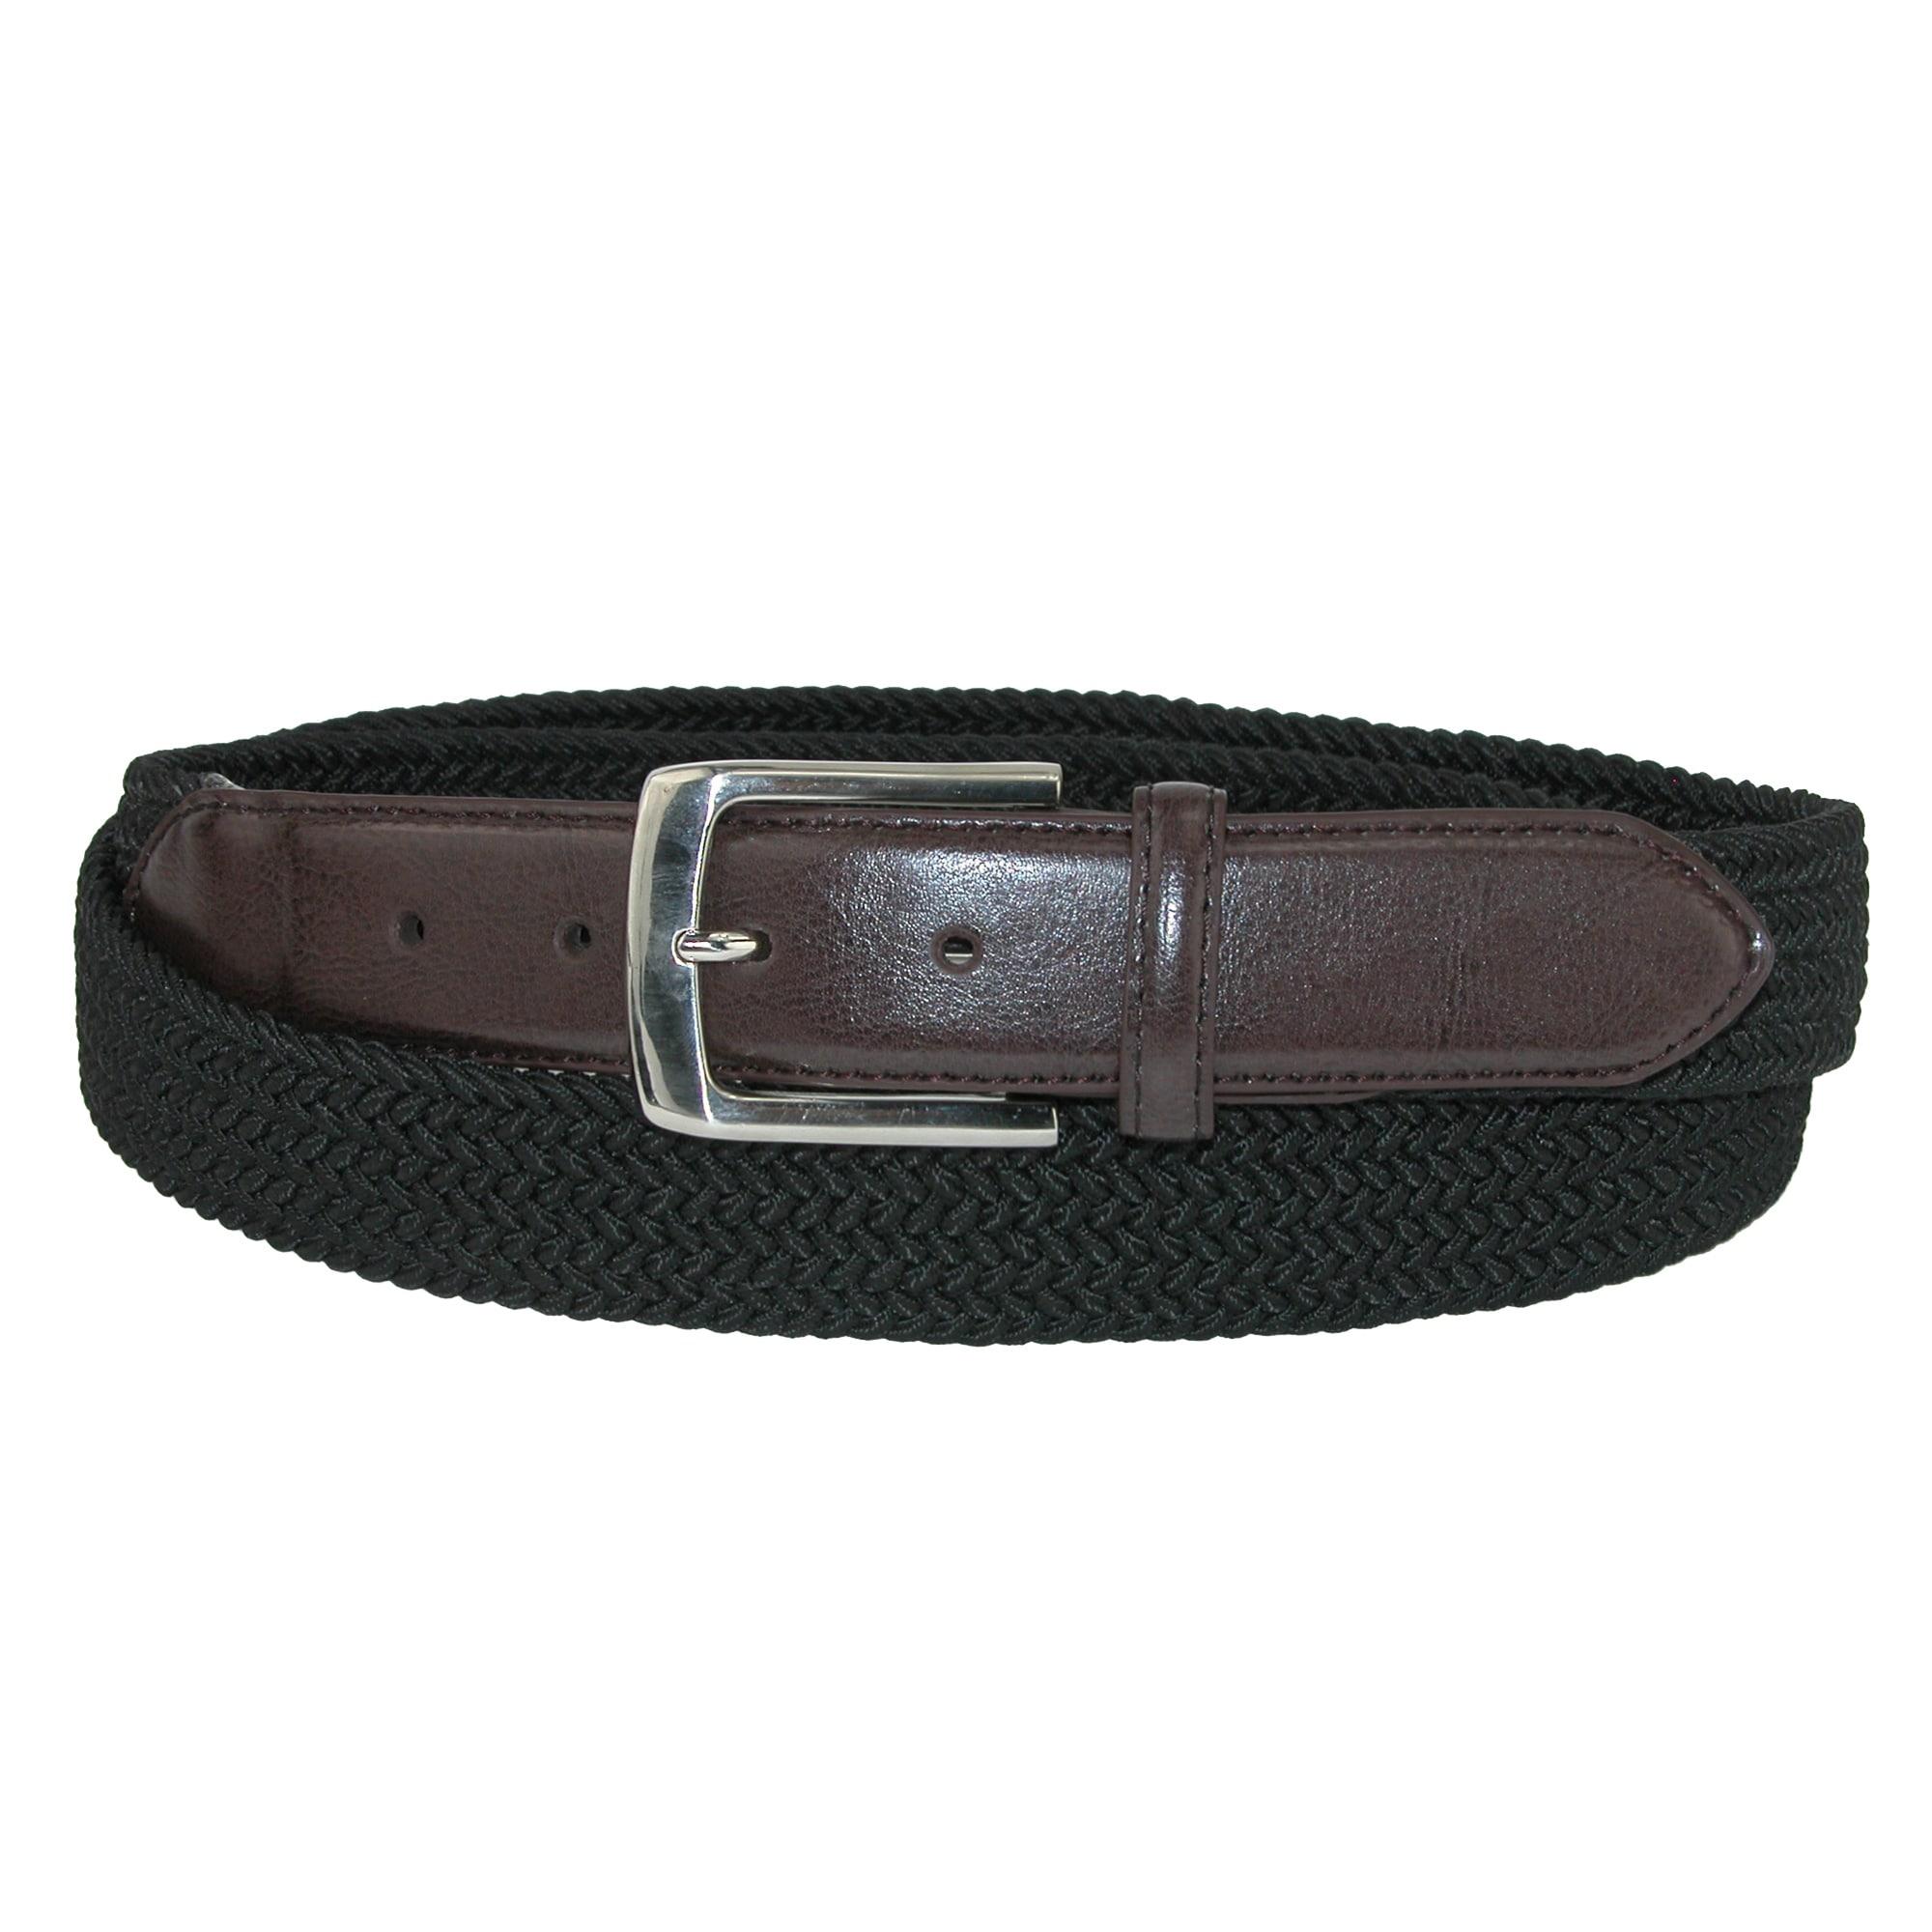 cd00ba585a3ab Shop Aquarius Men's Big & Tall Elastic Braided Belt - Free Shipping ...